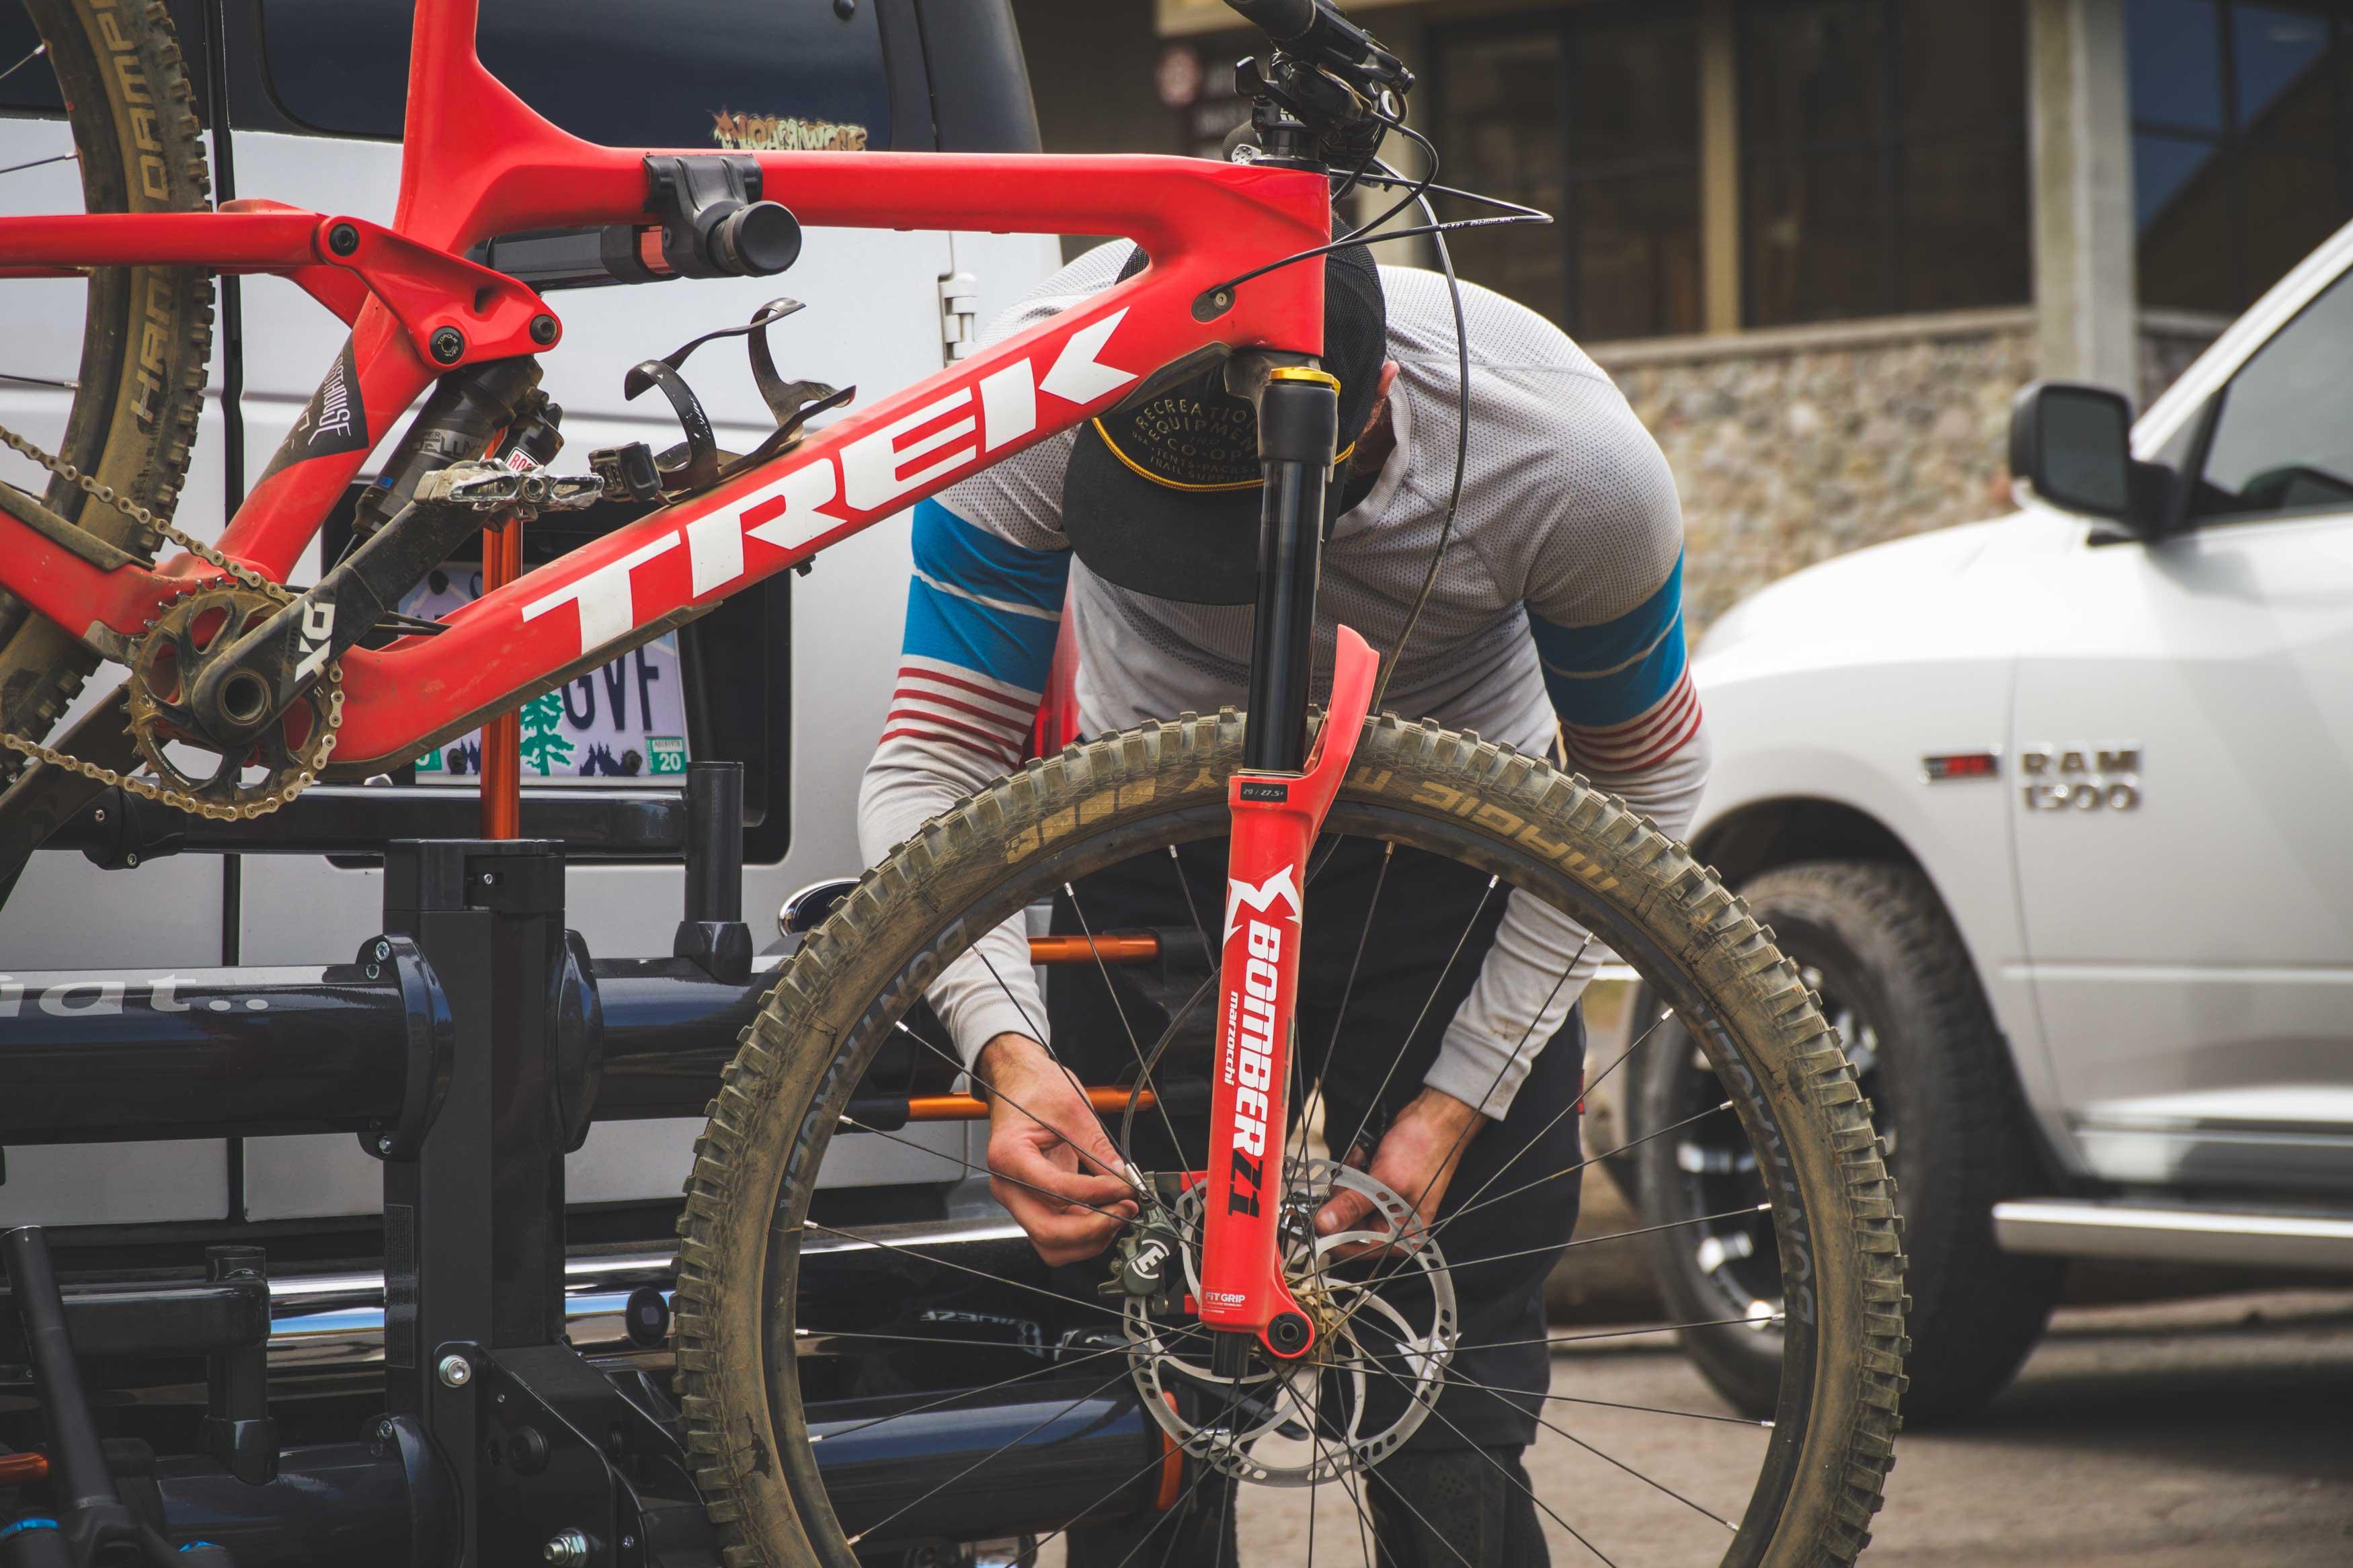 kuatt nv 2 0 bike rack review one of